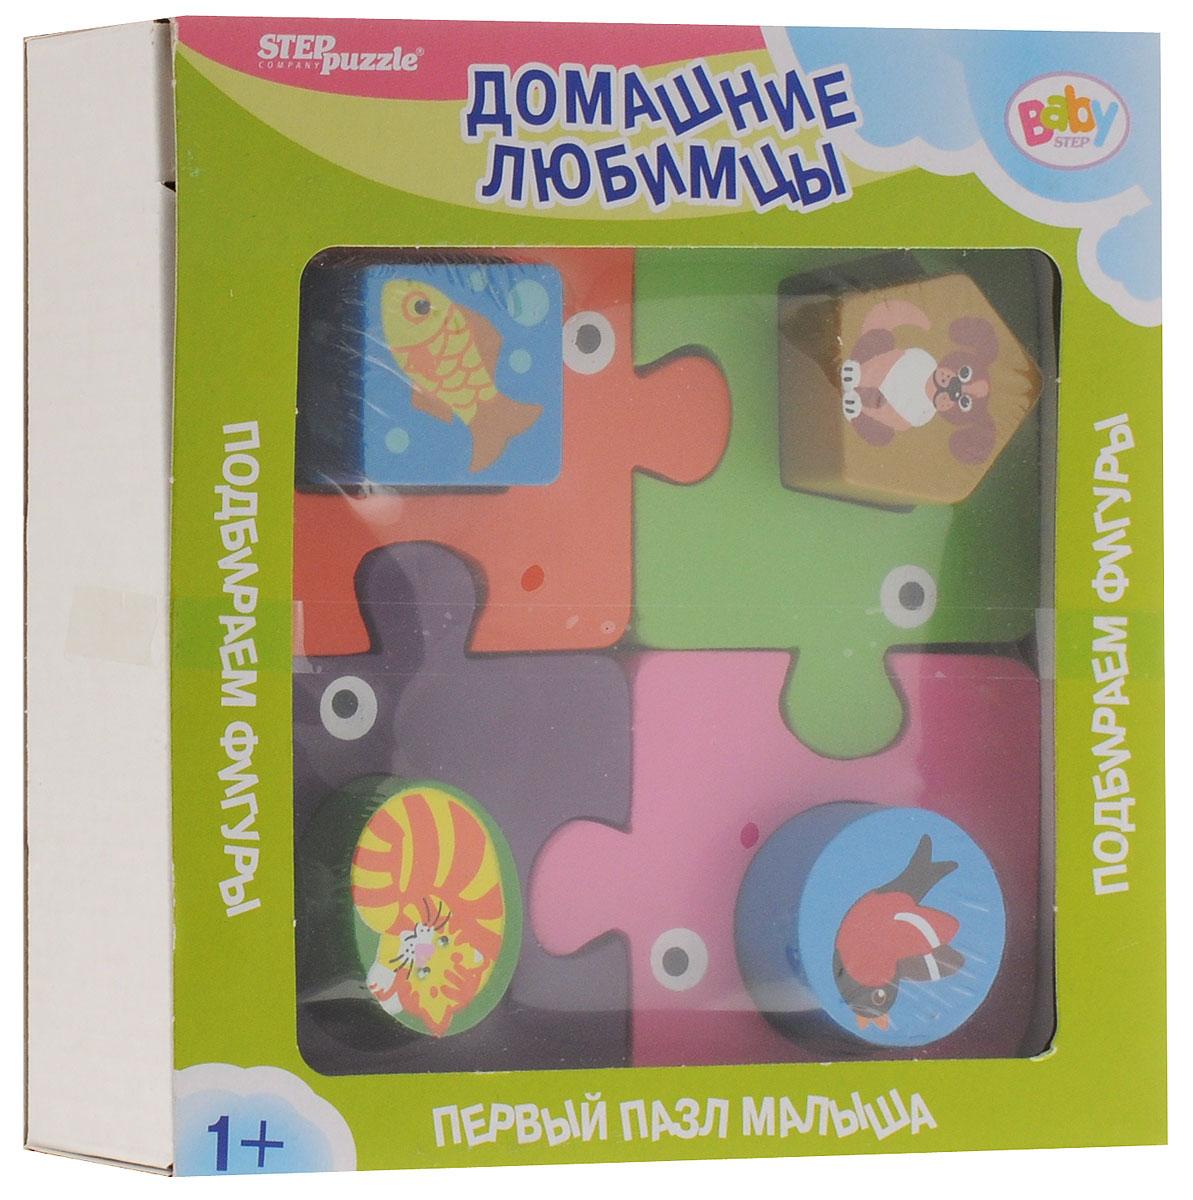 Step Puzzle Пазл для малышей Домашние любимцы step puzzle пазл для малышей тачки 89122